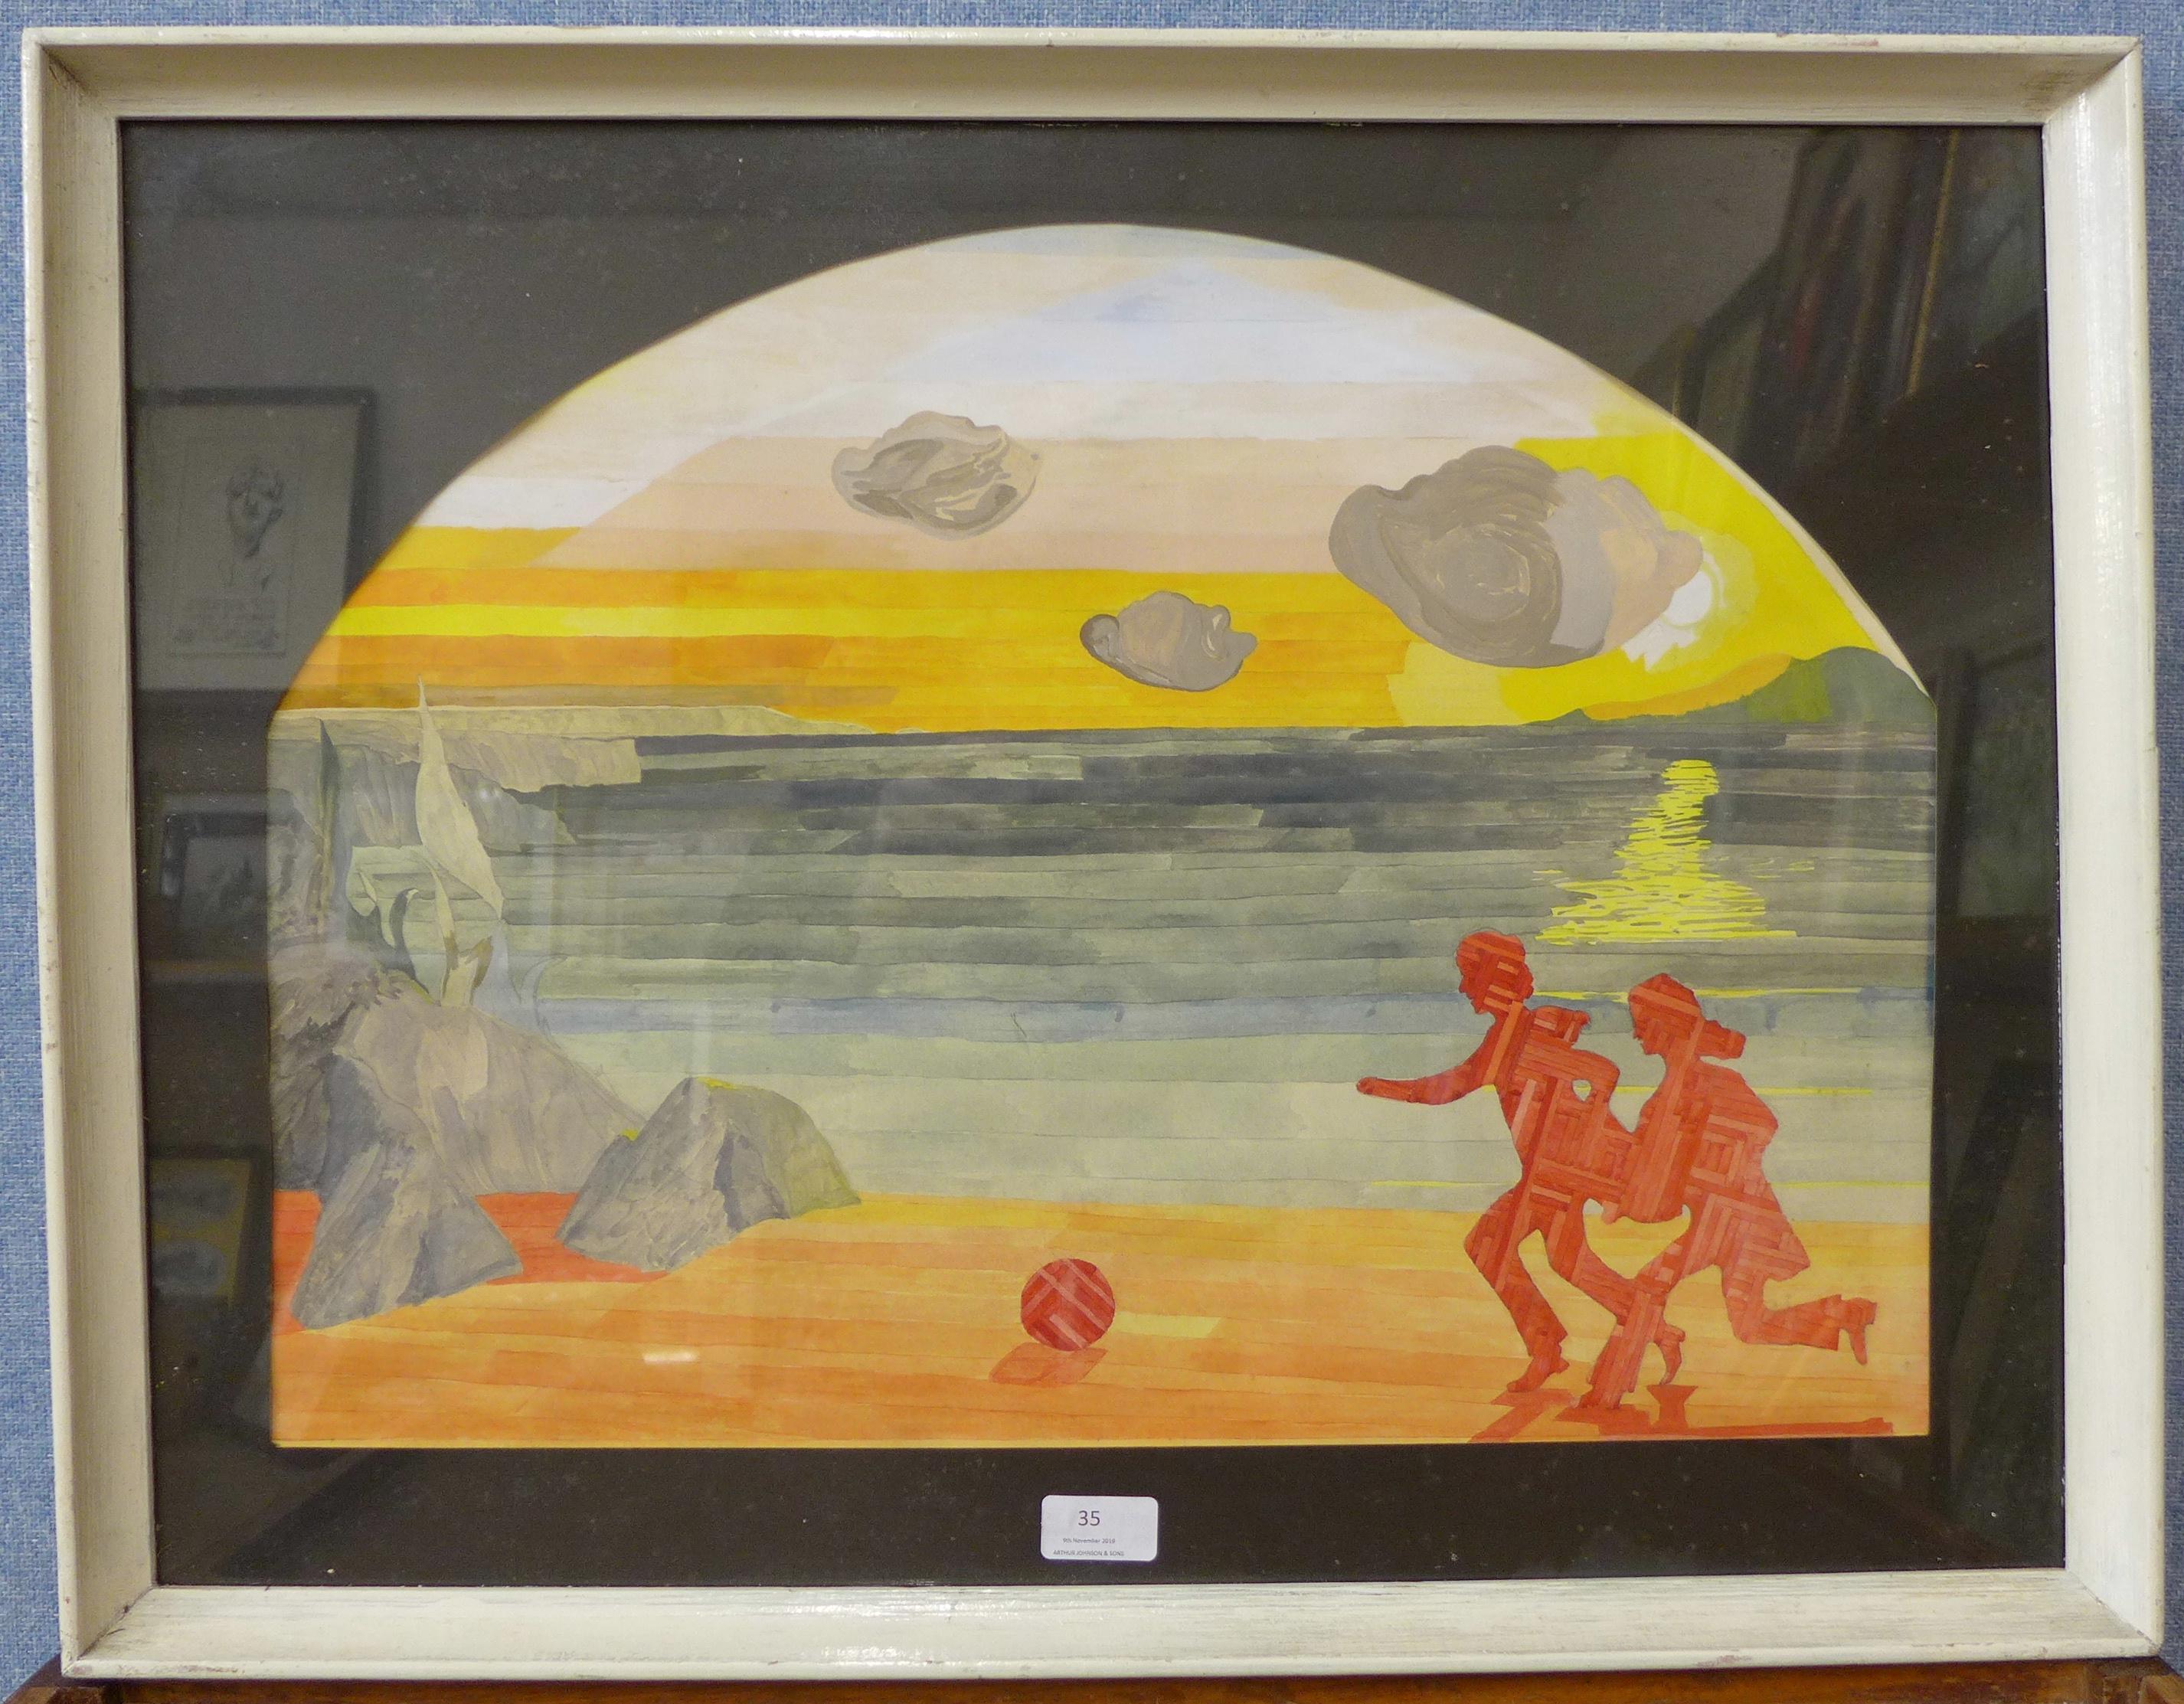 Lot 35 - Howard Chambers (Cubist School), beach landscape, gouache,